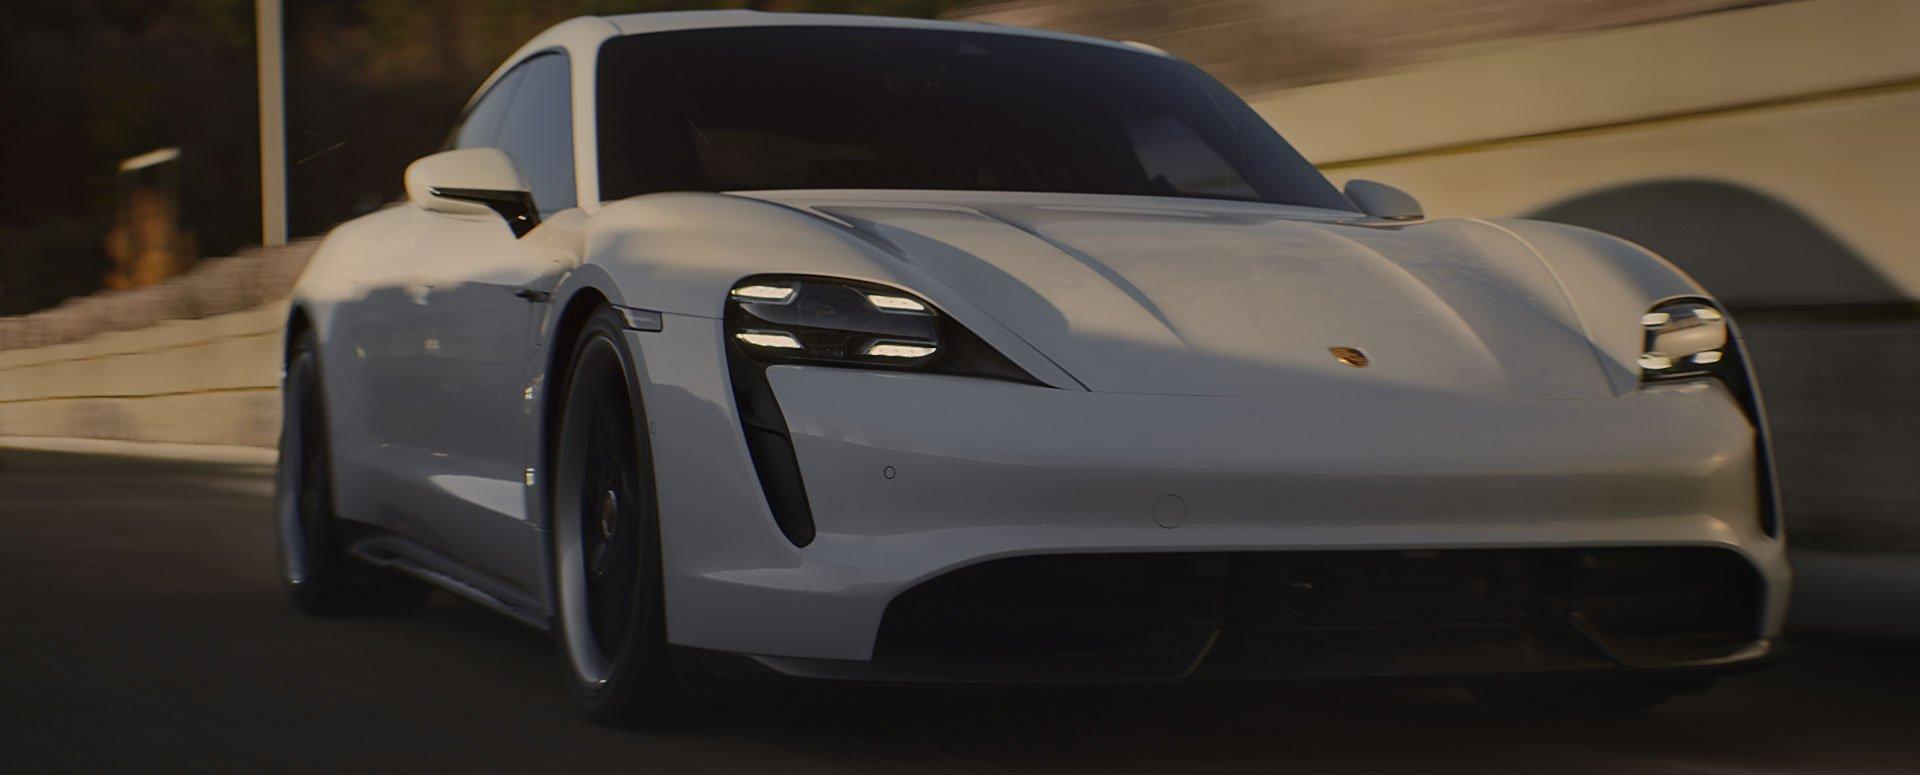 Thumbnail for Porsche - The Heist